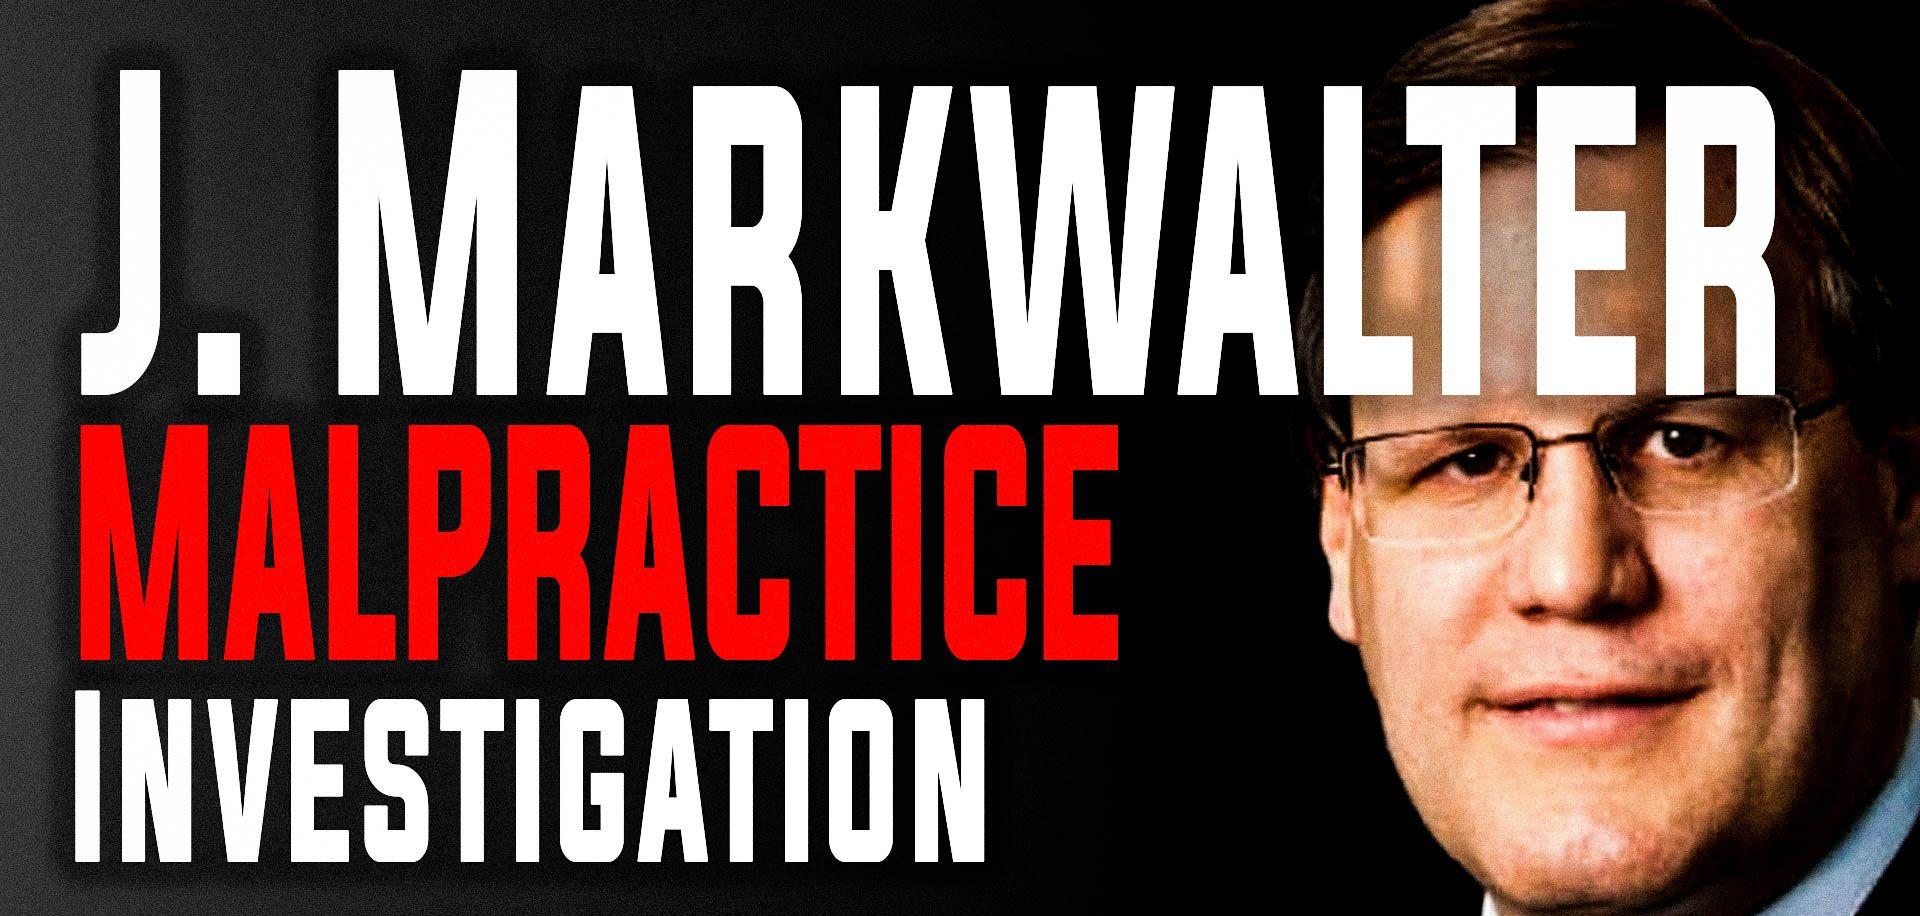 John Markwalter